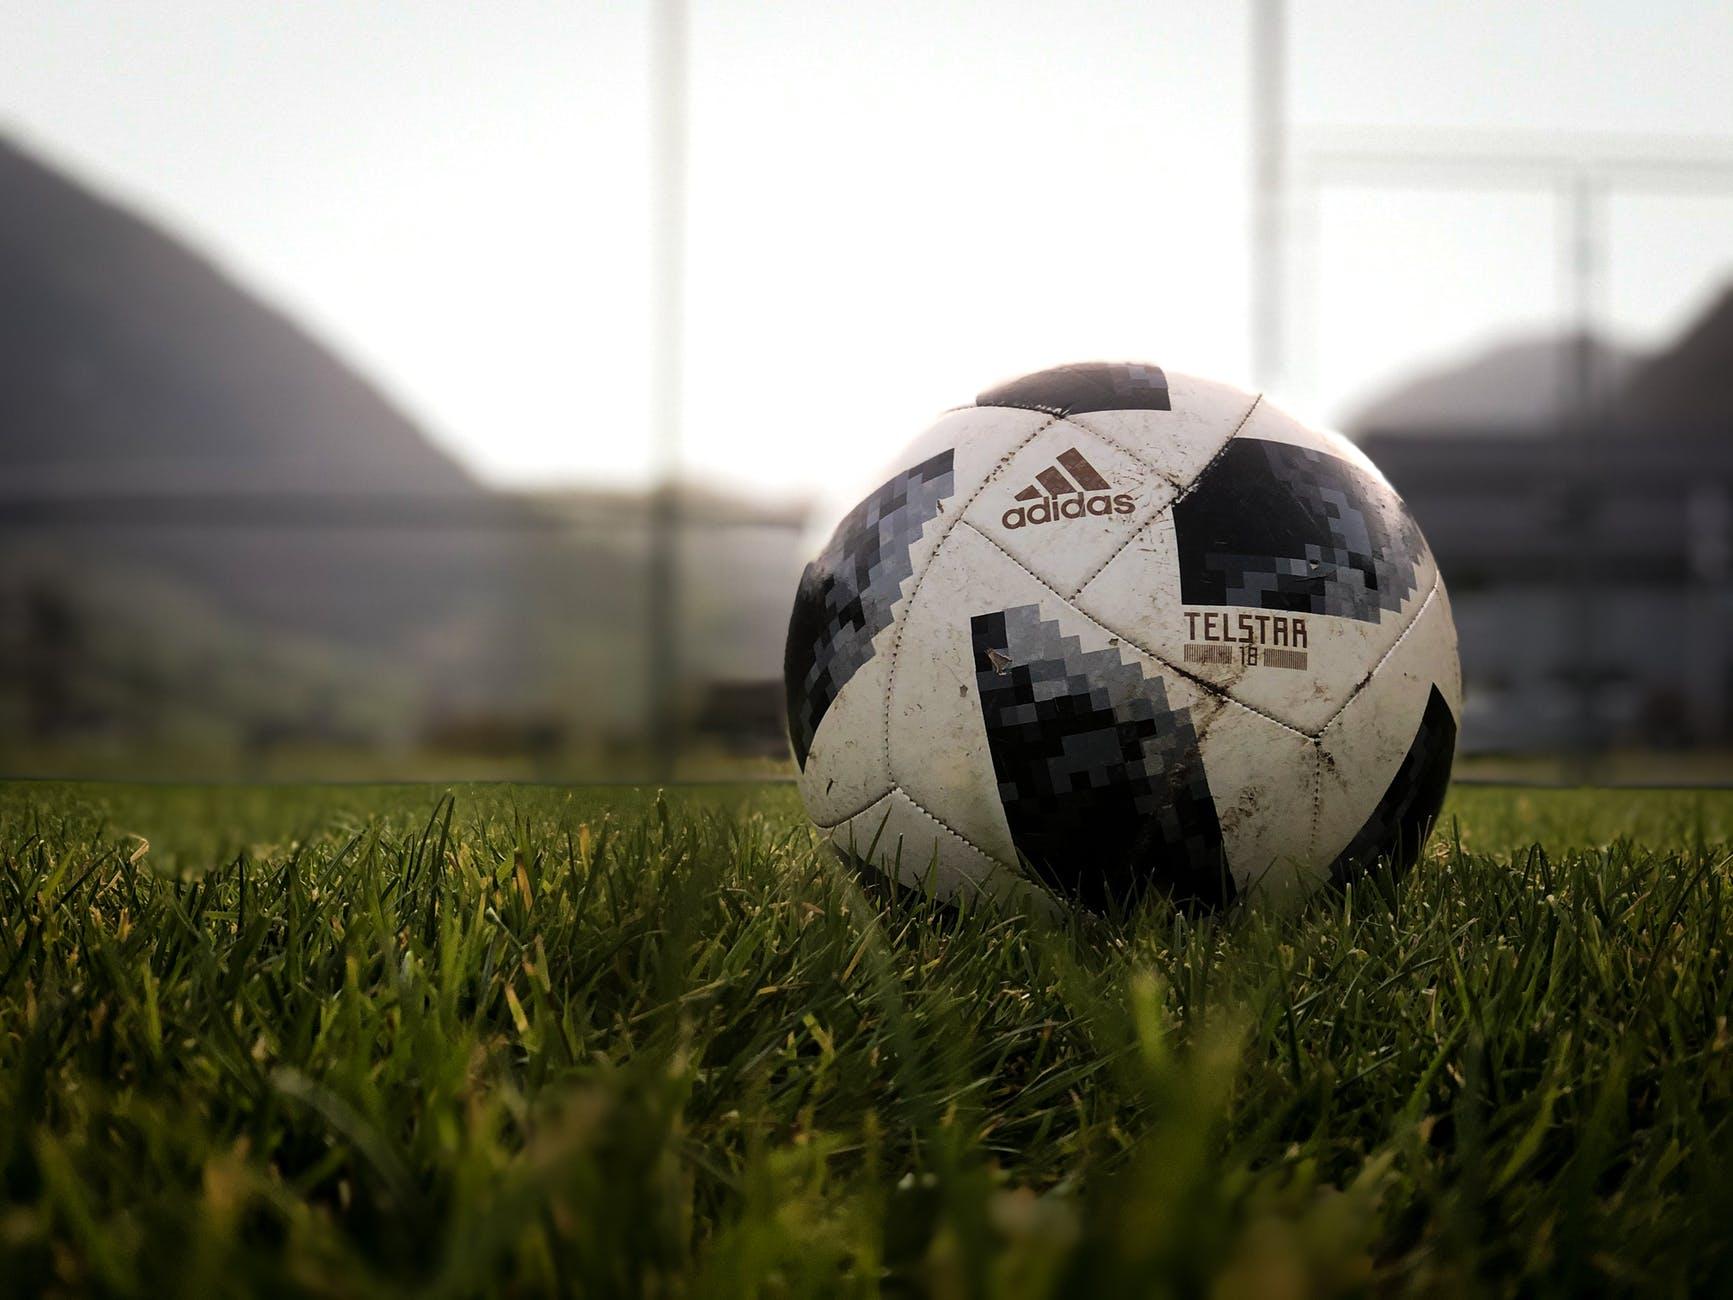 a soccer ball on the grass